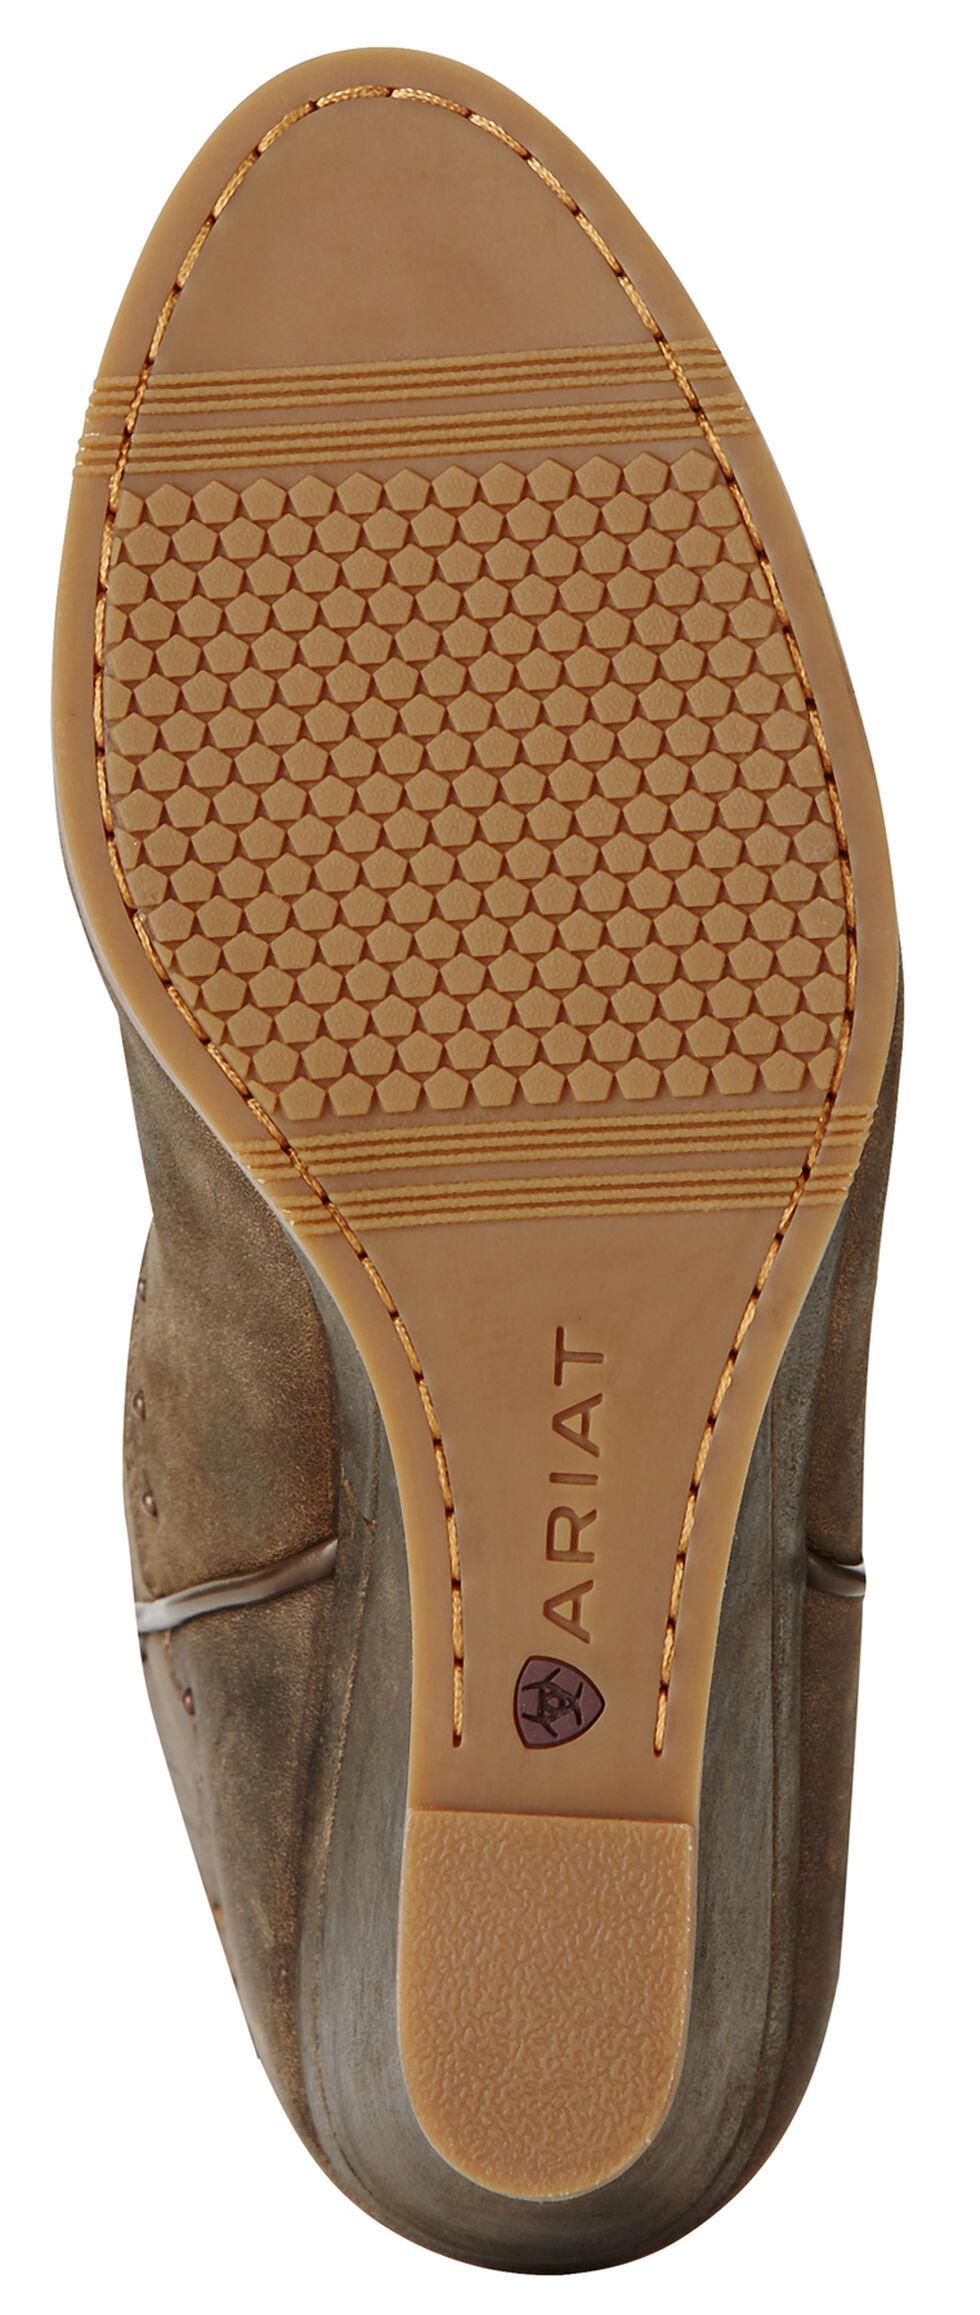 Ariat Dark Chocolate Nashville Wedge Cowgirl Boots - Round Toe , Chocolate, hi-res